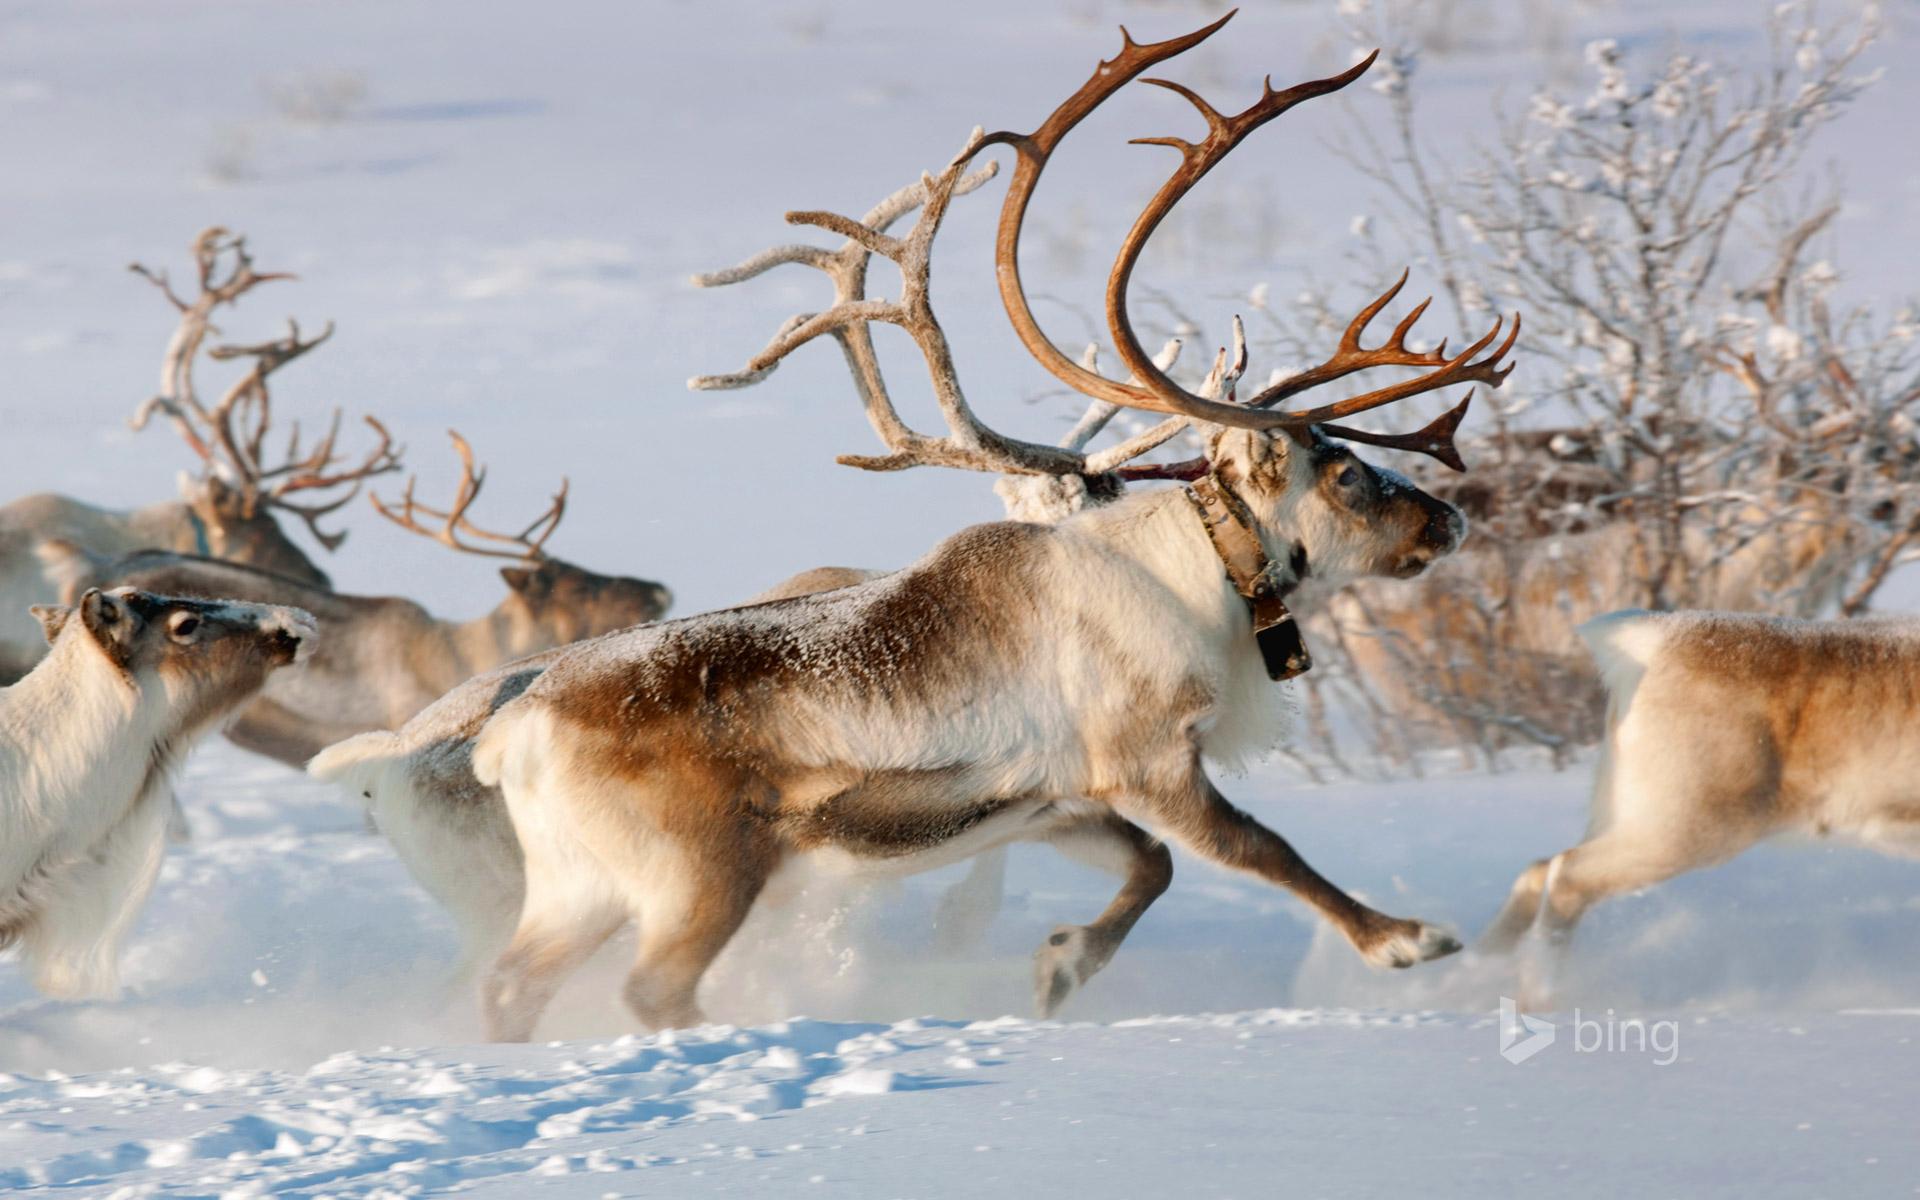 reindeer bing